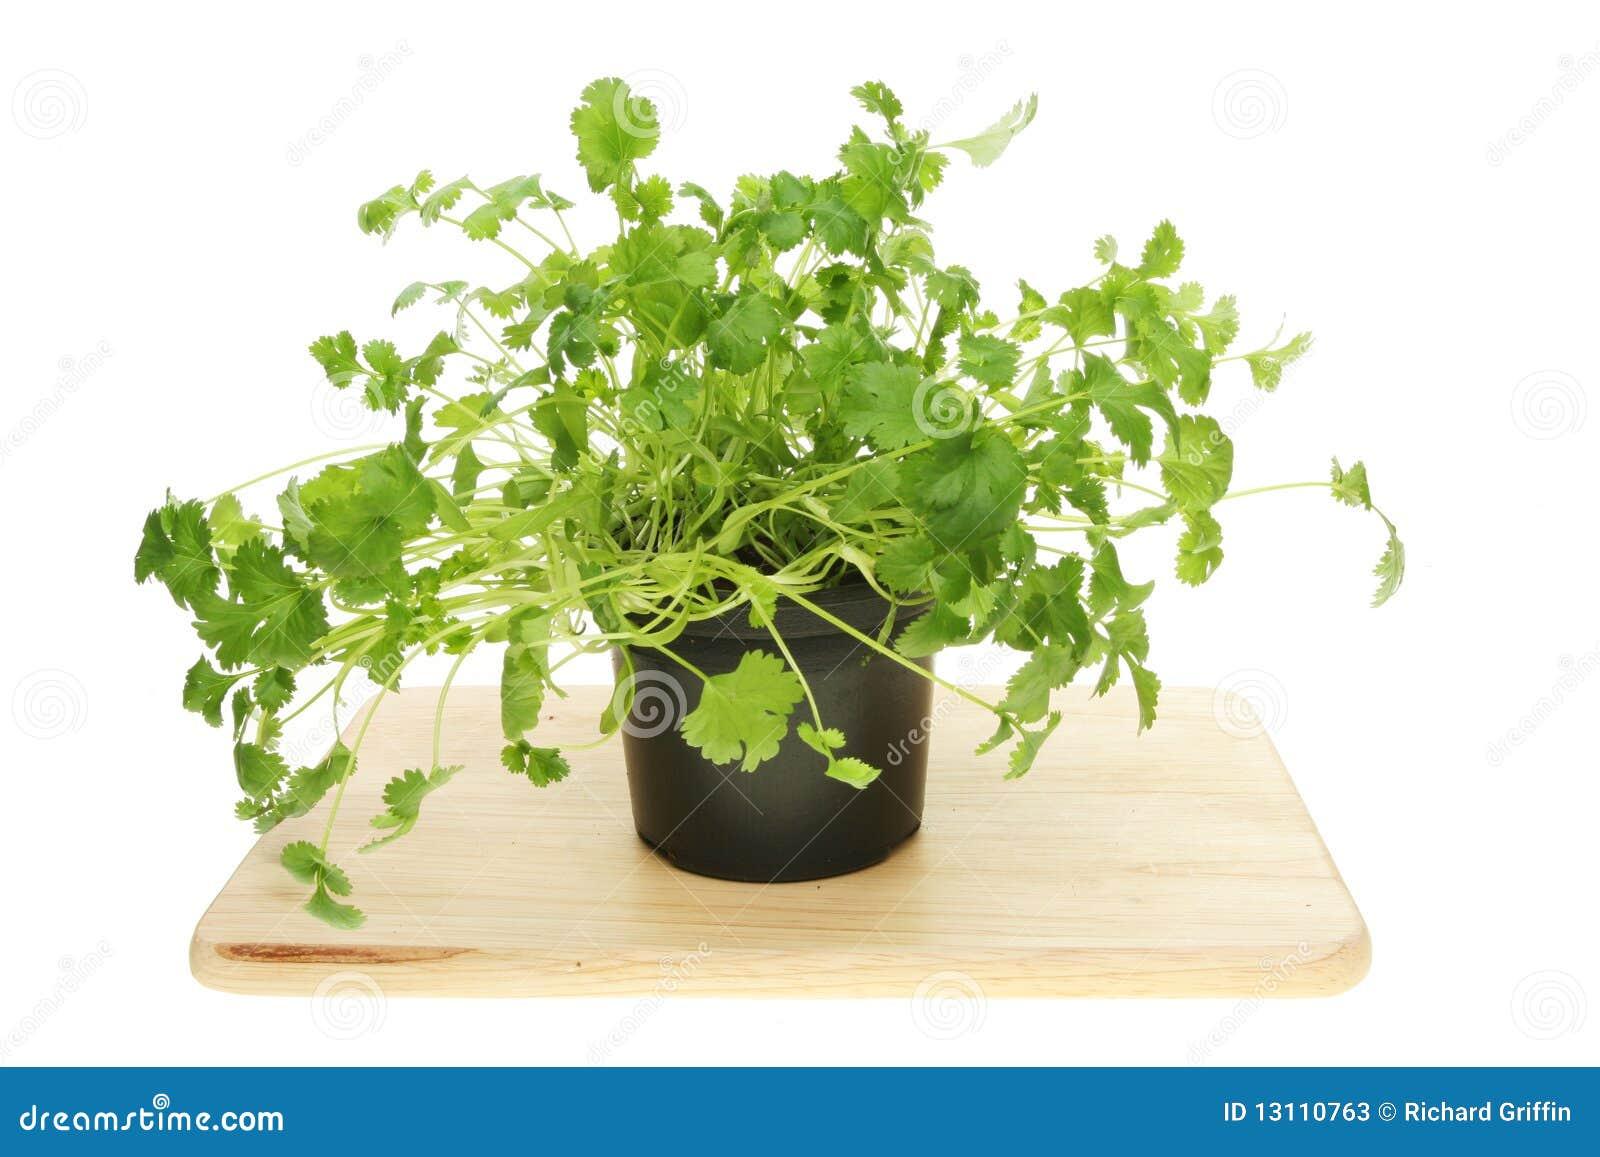 Living Coriander Herb Stock Photos Image 13110763